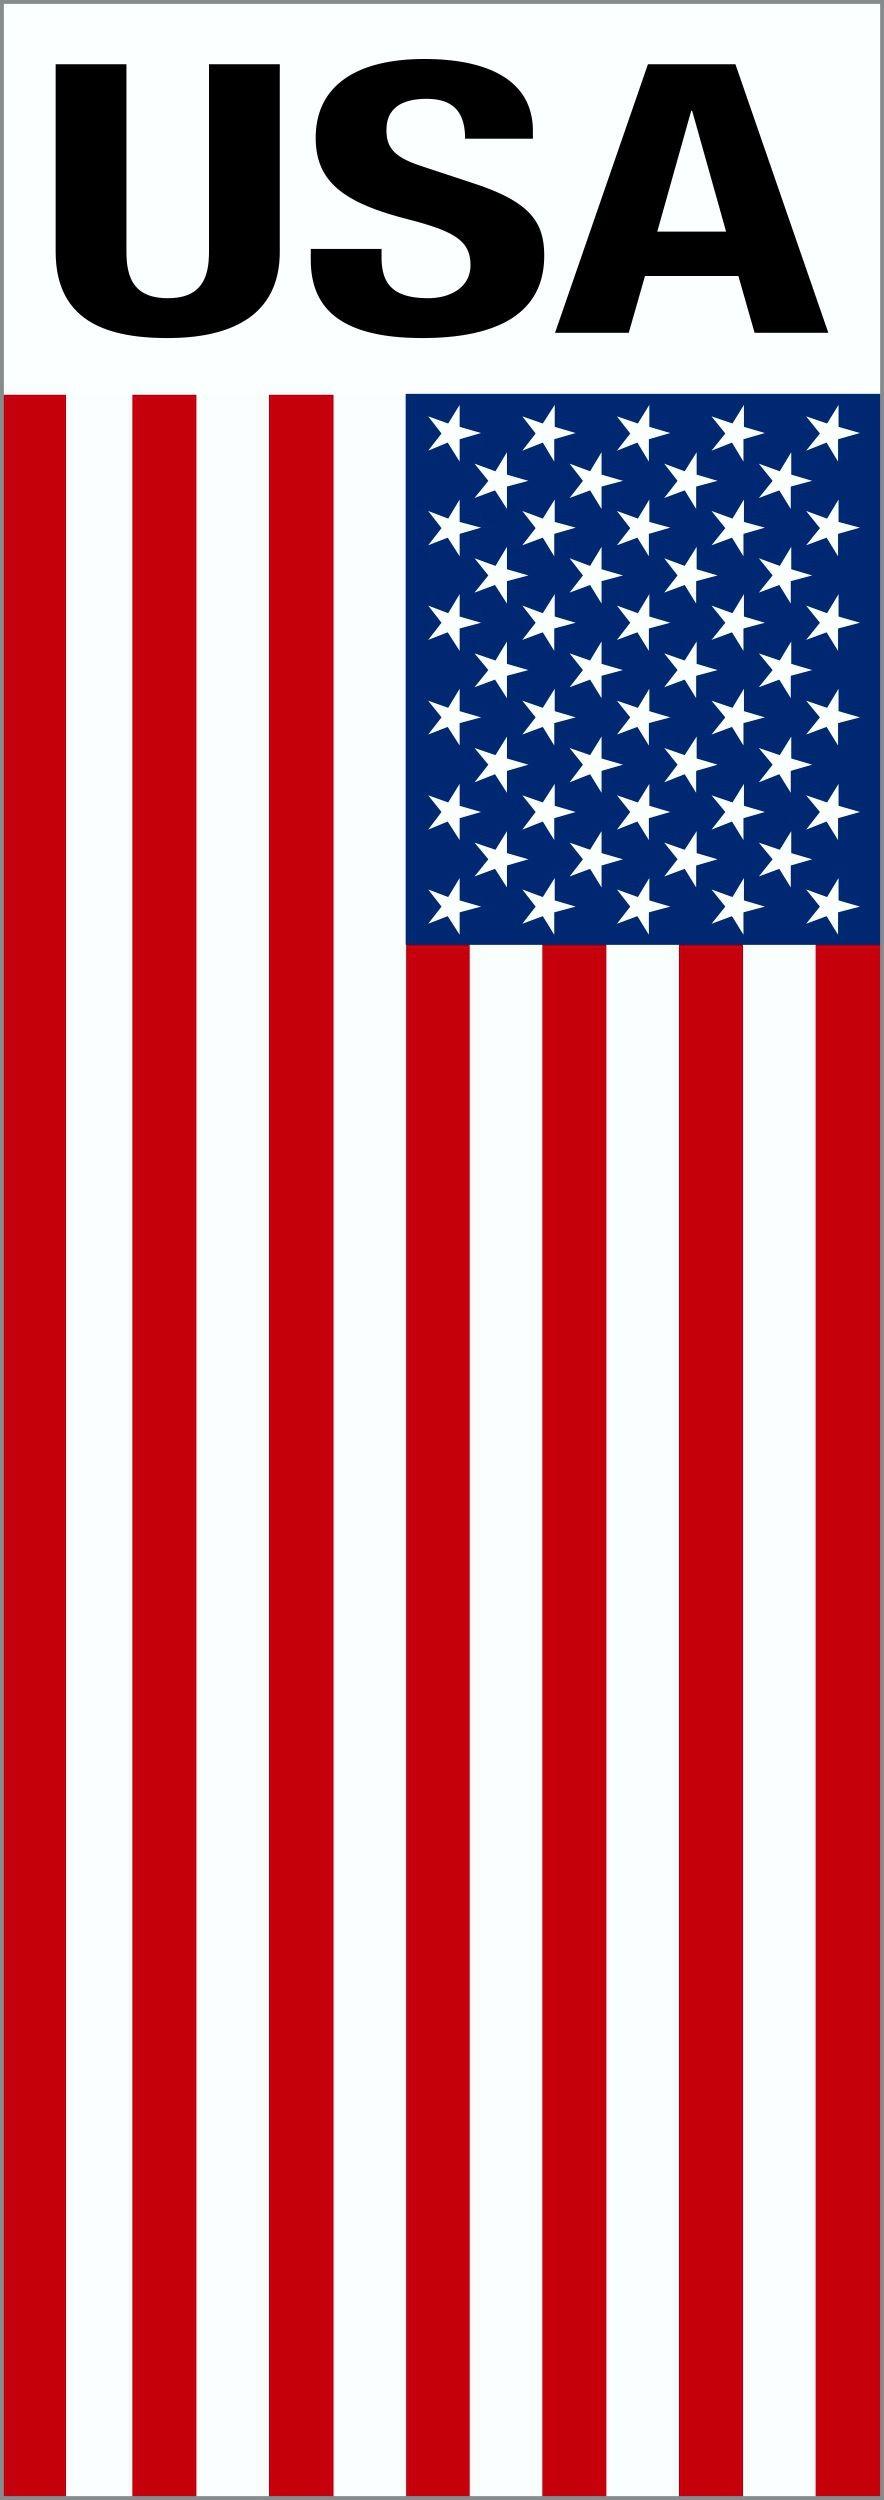 Aufkleber Flagge mit Schriftzug USA 110 x 40 mm – Bild 1